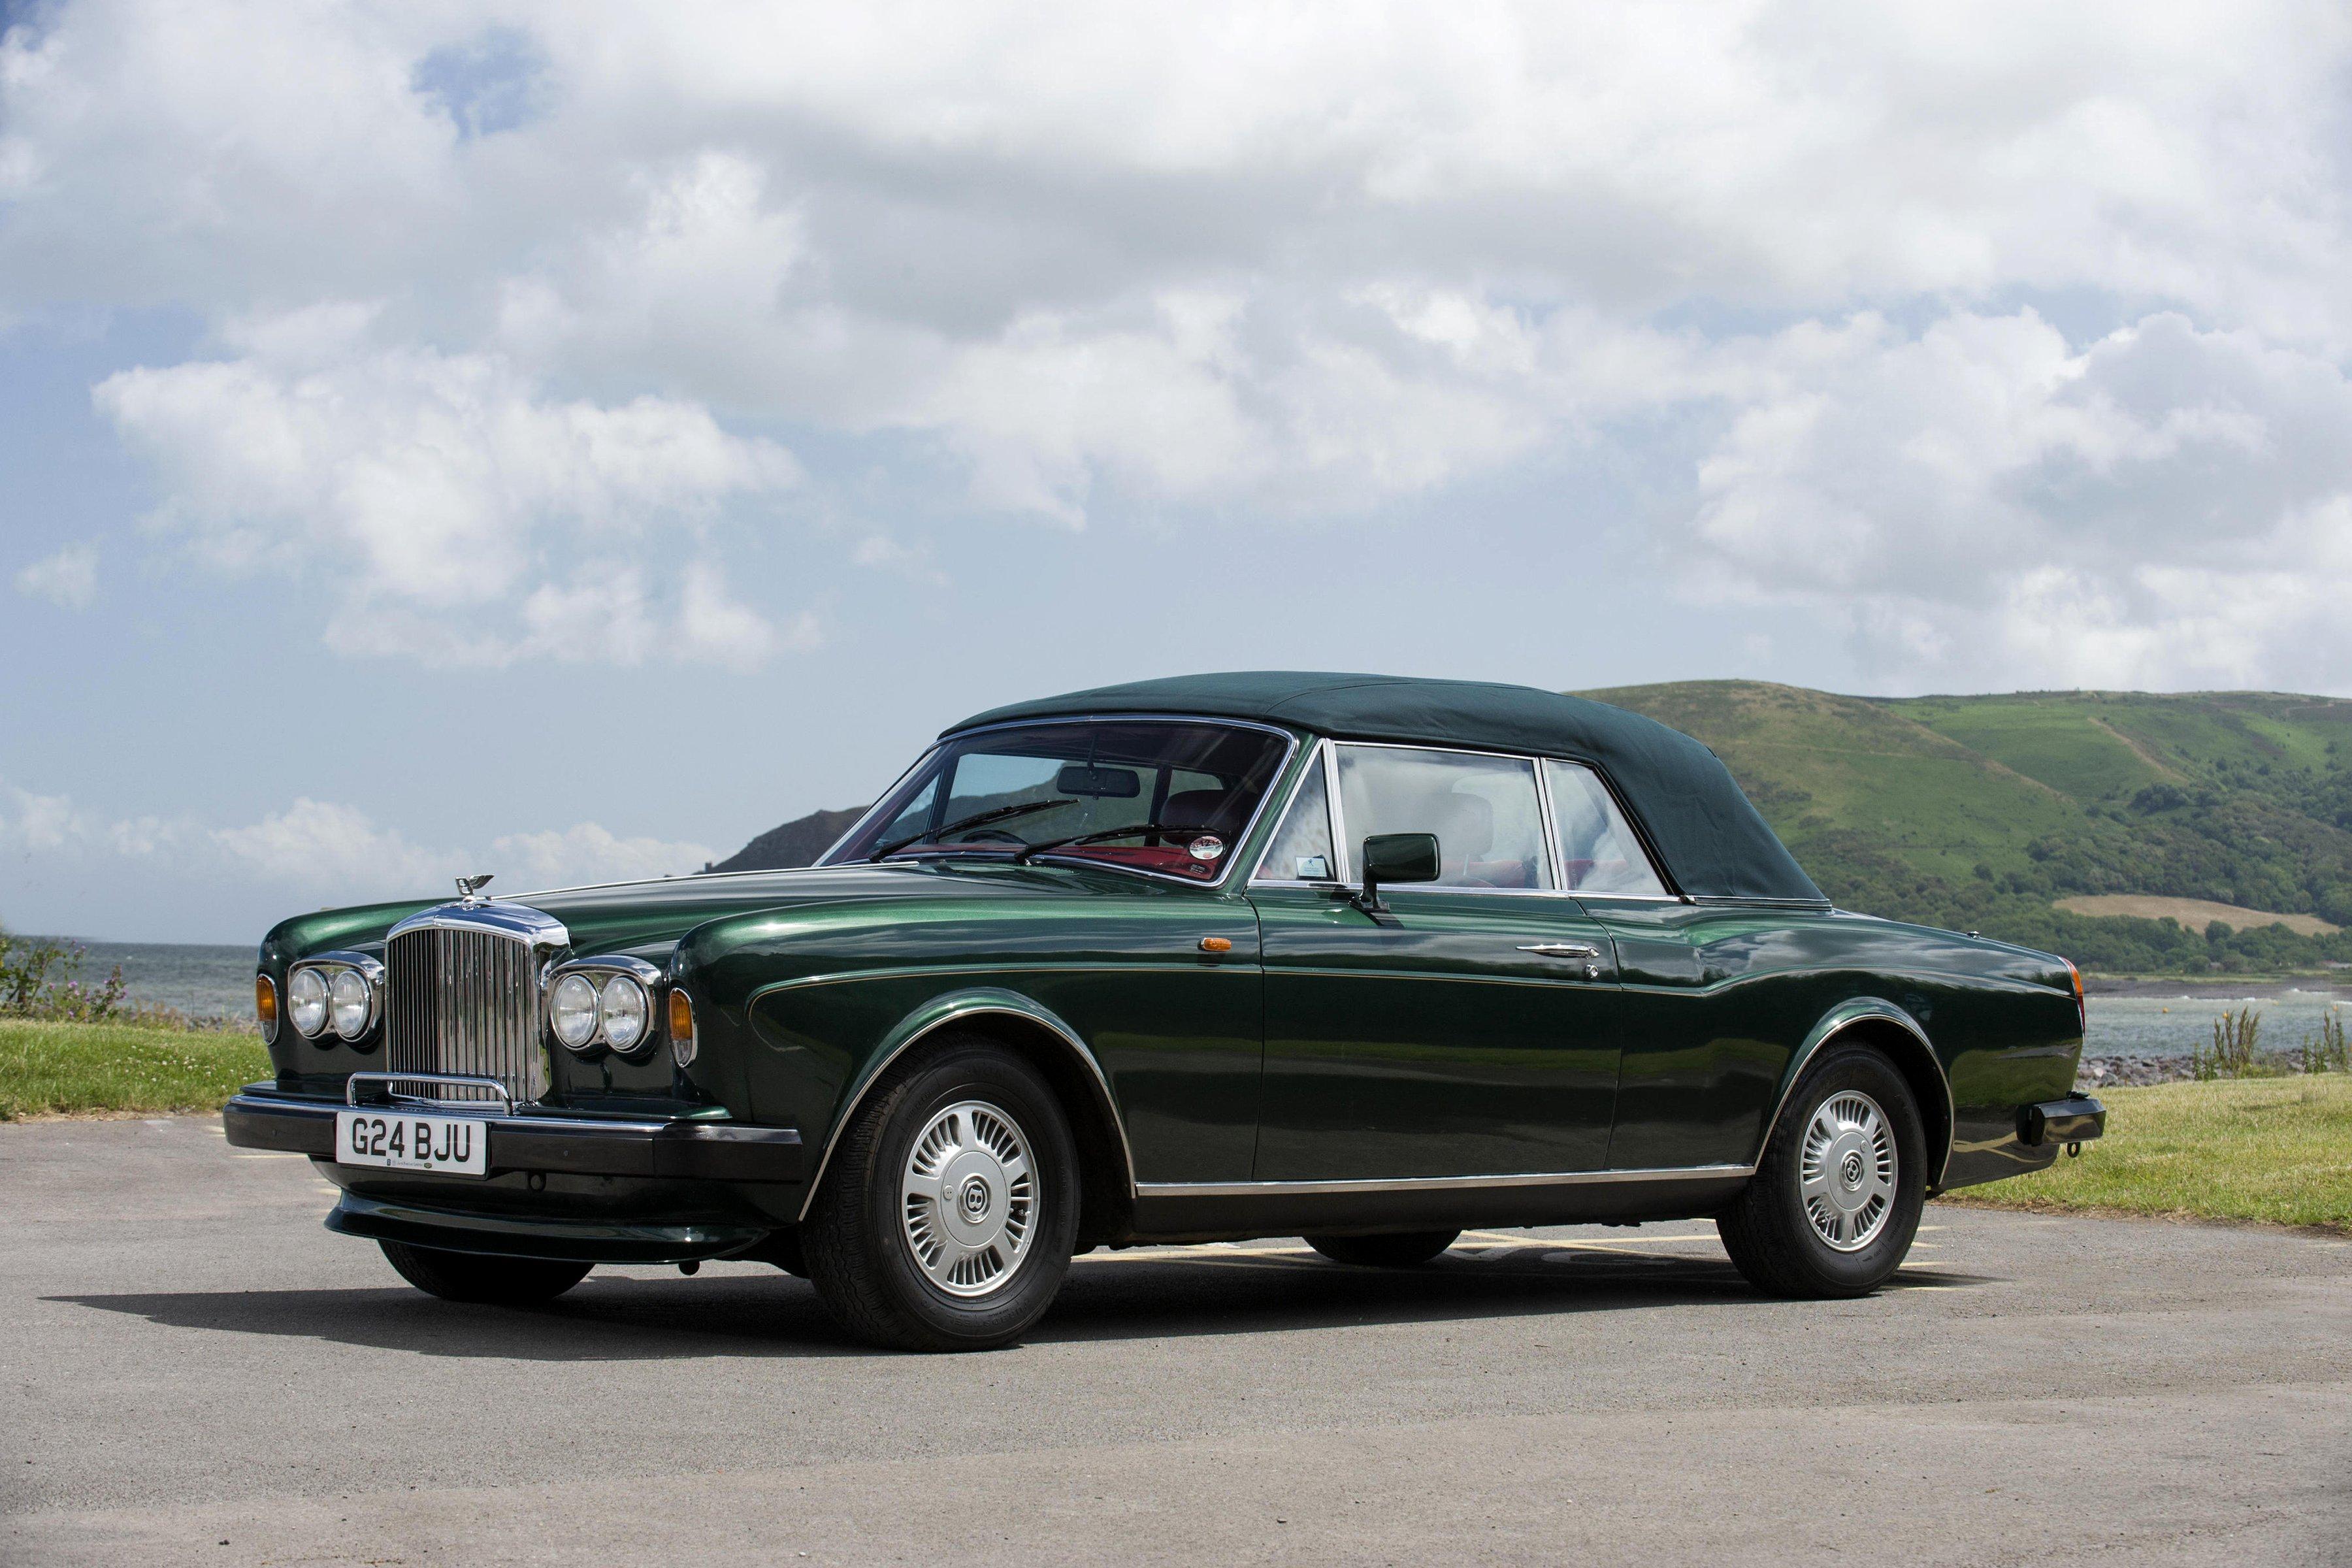 Bentley continental convertible uk spec cars classic 1990 wallpaper 3600x2400 788378 wallpaperup